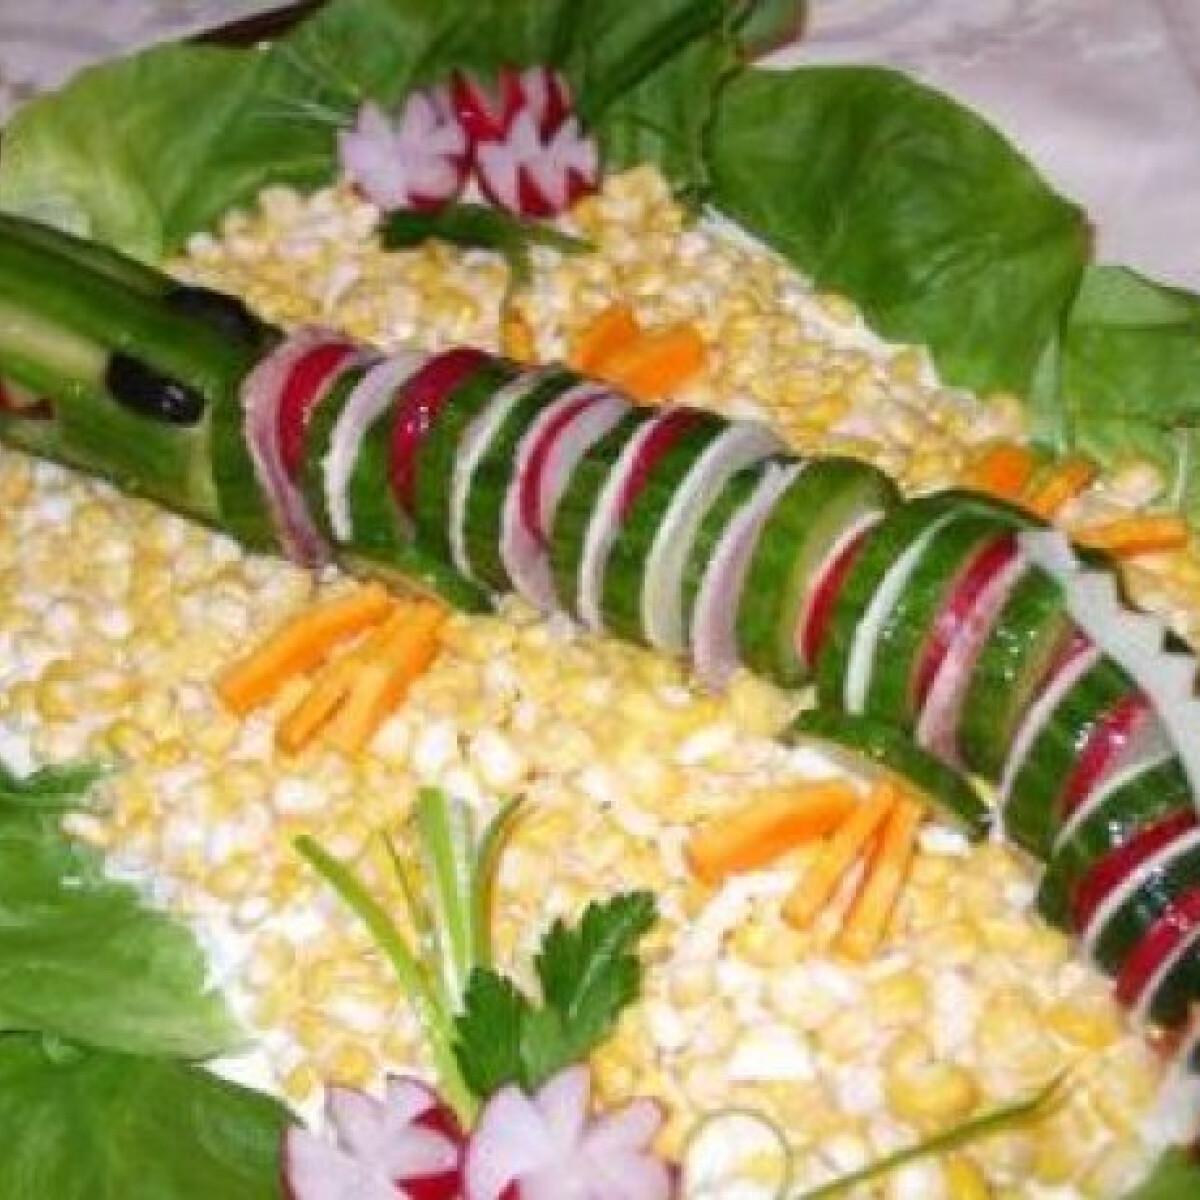 Majonézes kukorica krokodillal